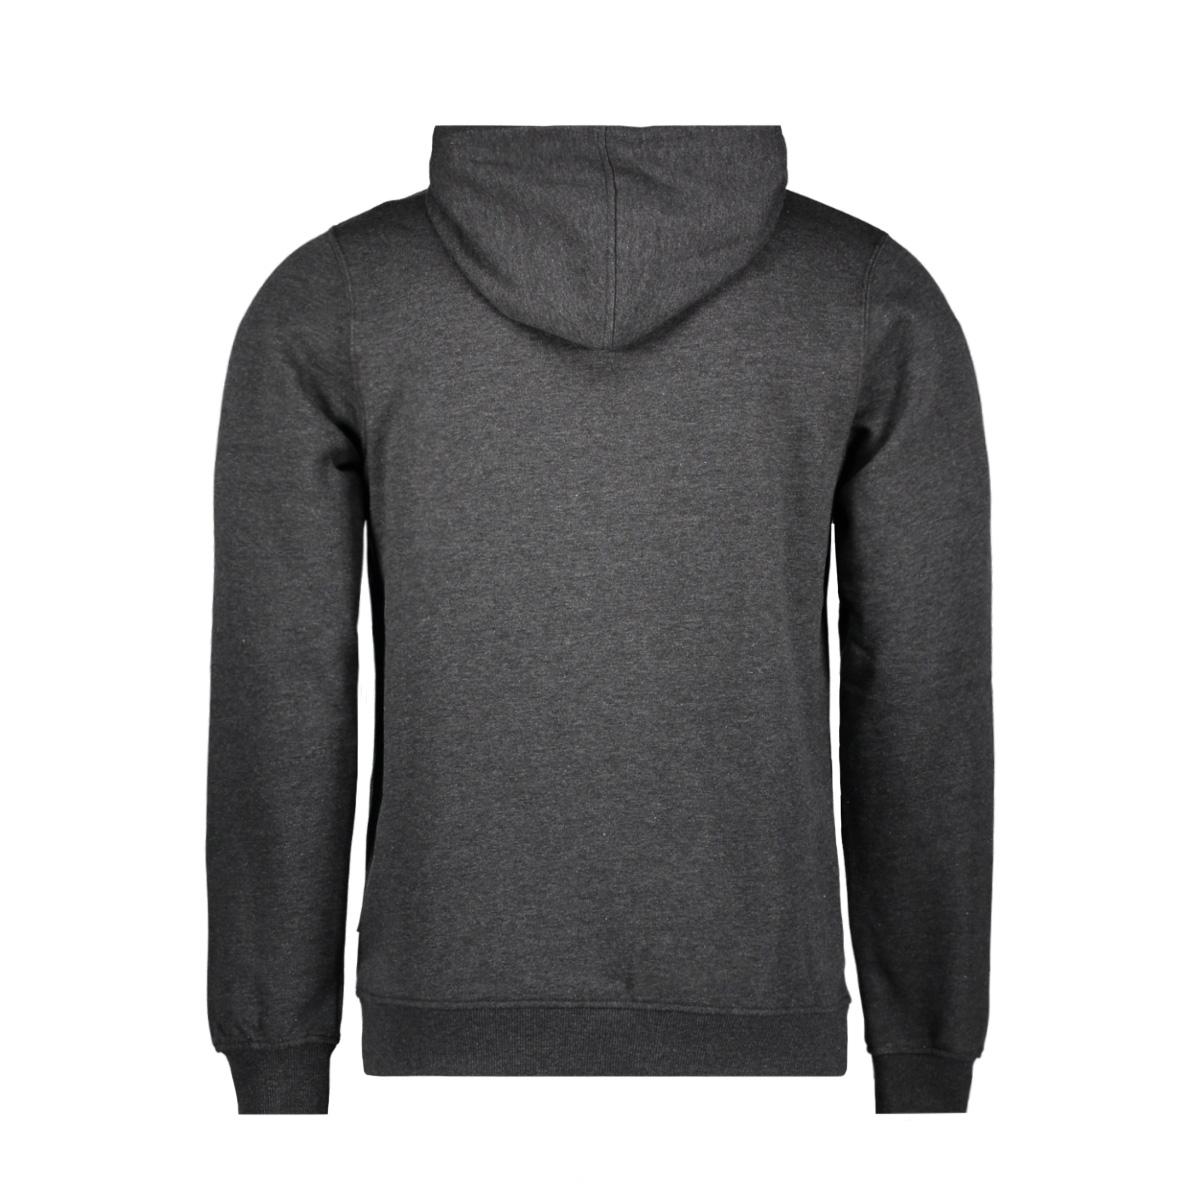 jcolano sweat hood bf 12128568 jack & jones sweater dark grey melan